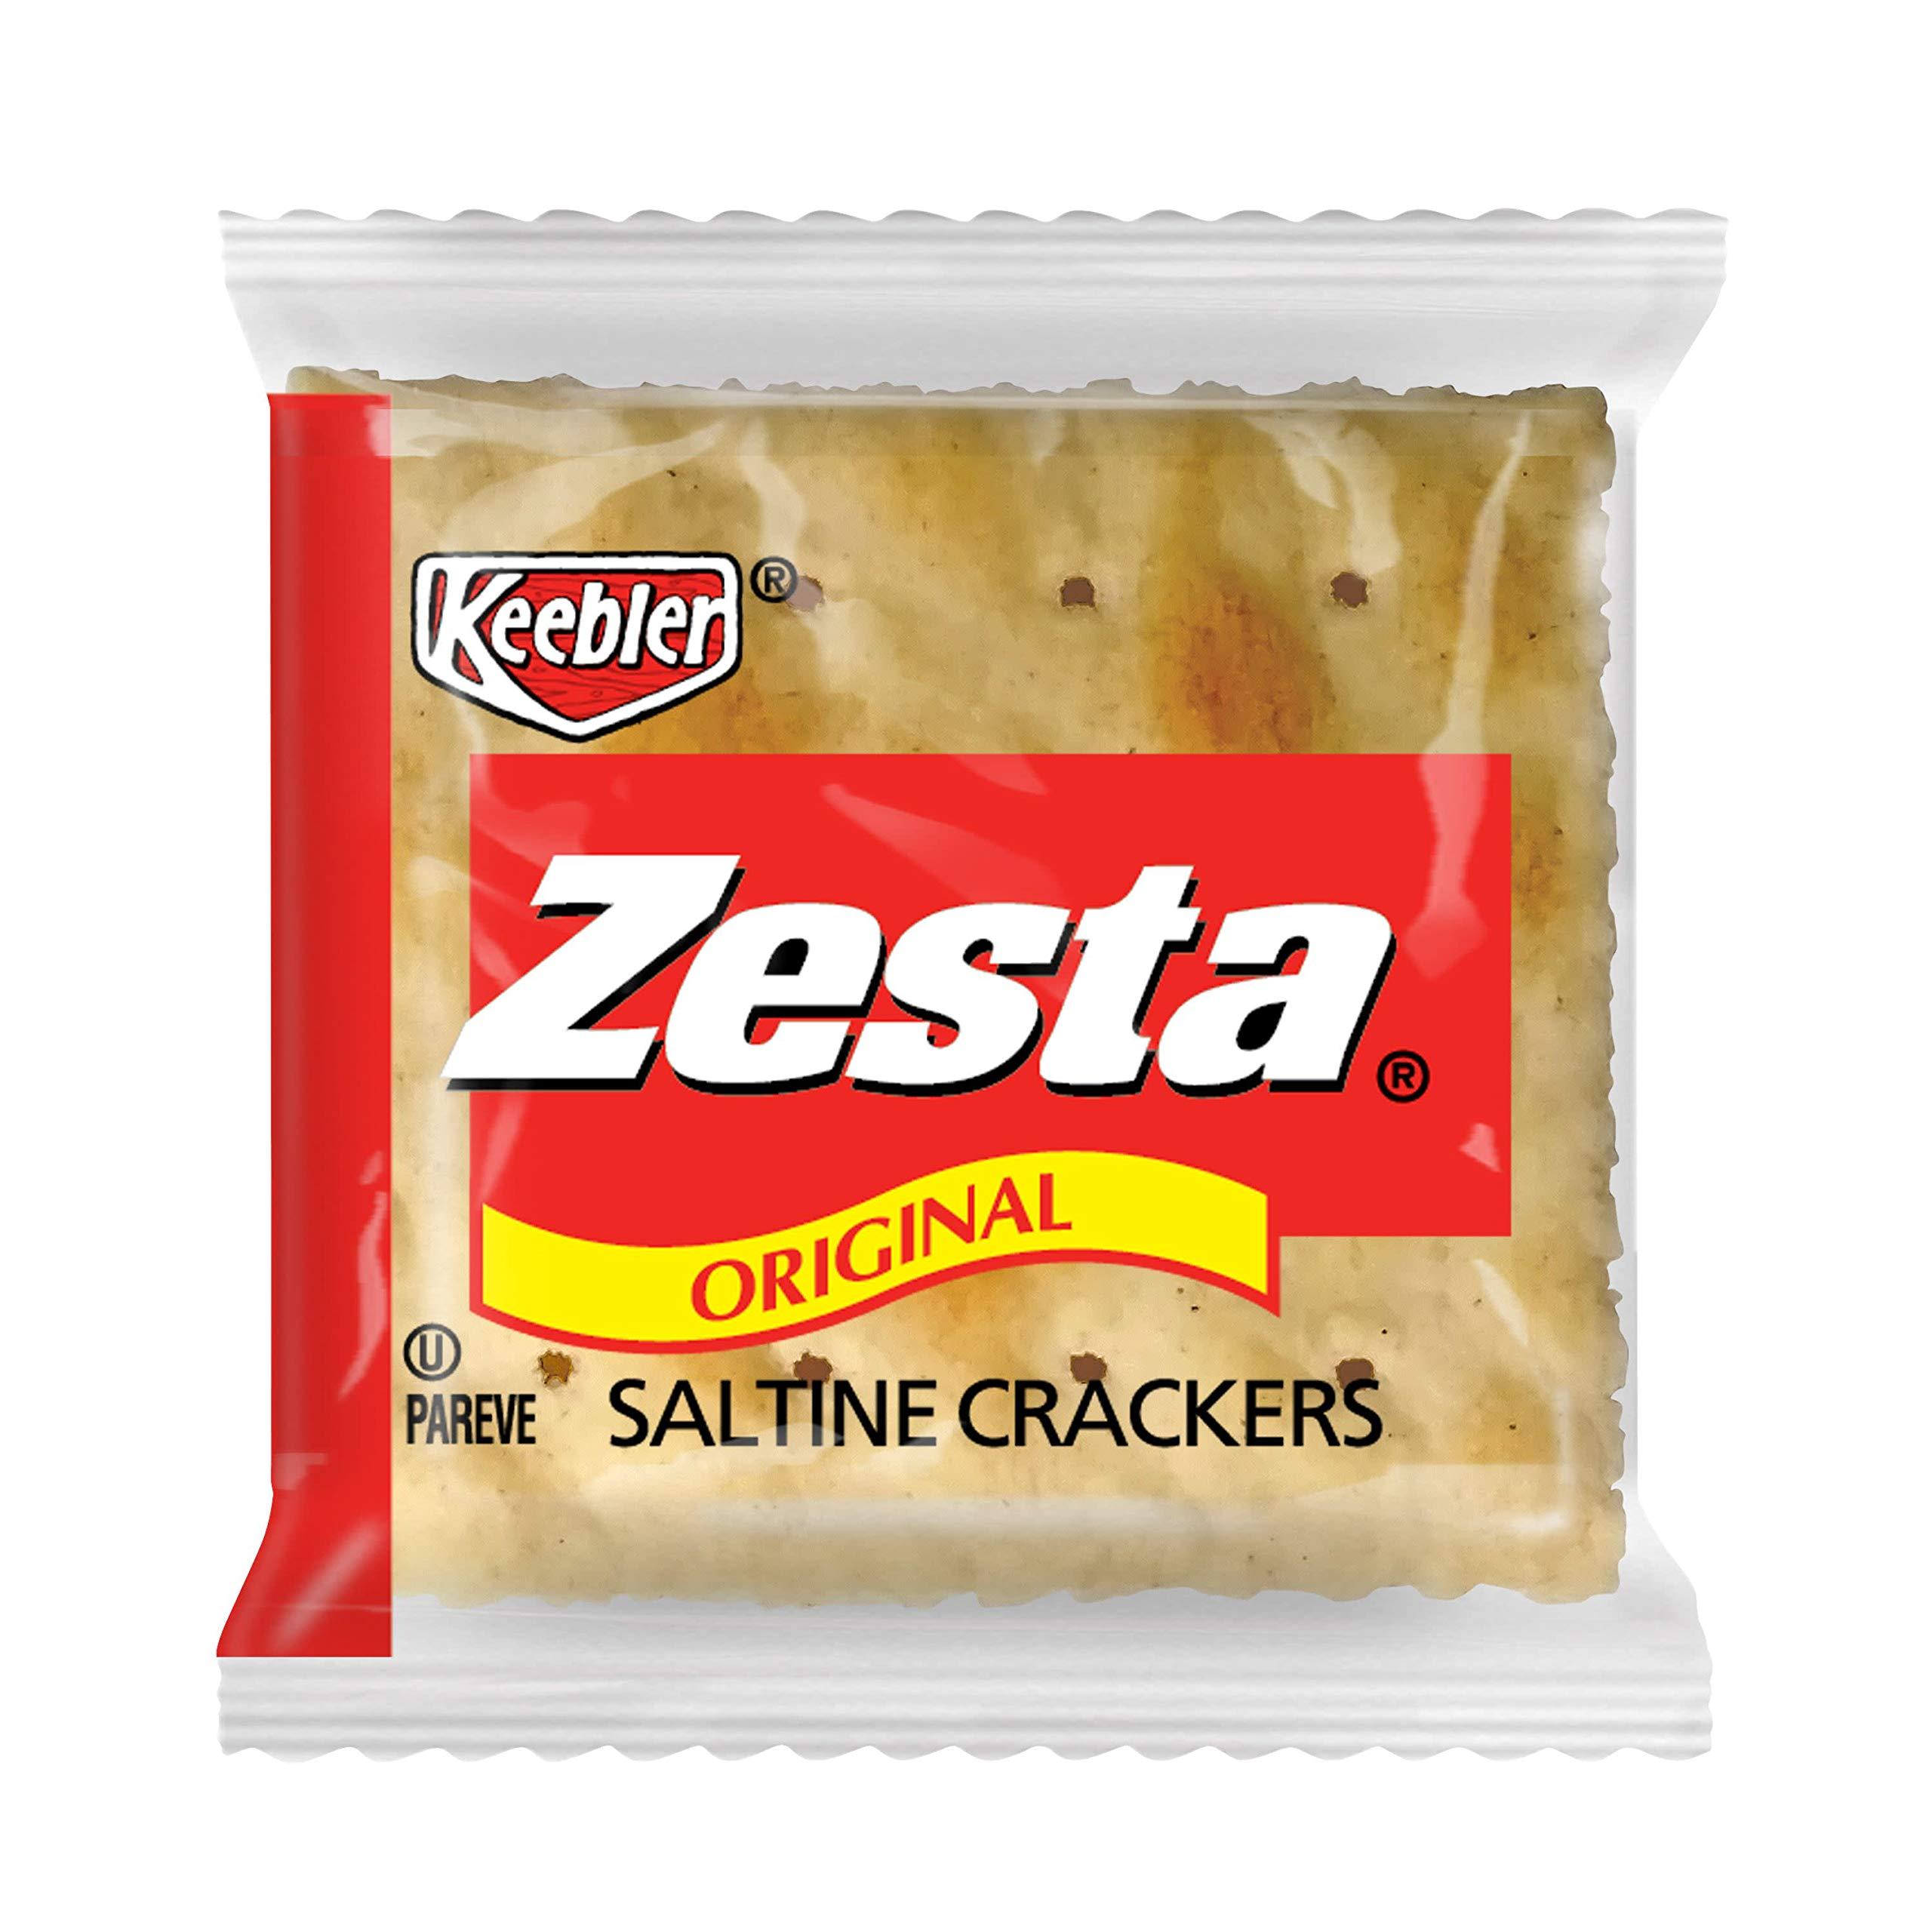 Keebler, Zesta, Saltine Crackers, Original, Single Serve, 0.20 oz(Pack of 300) by Zesta